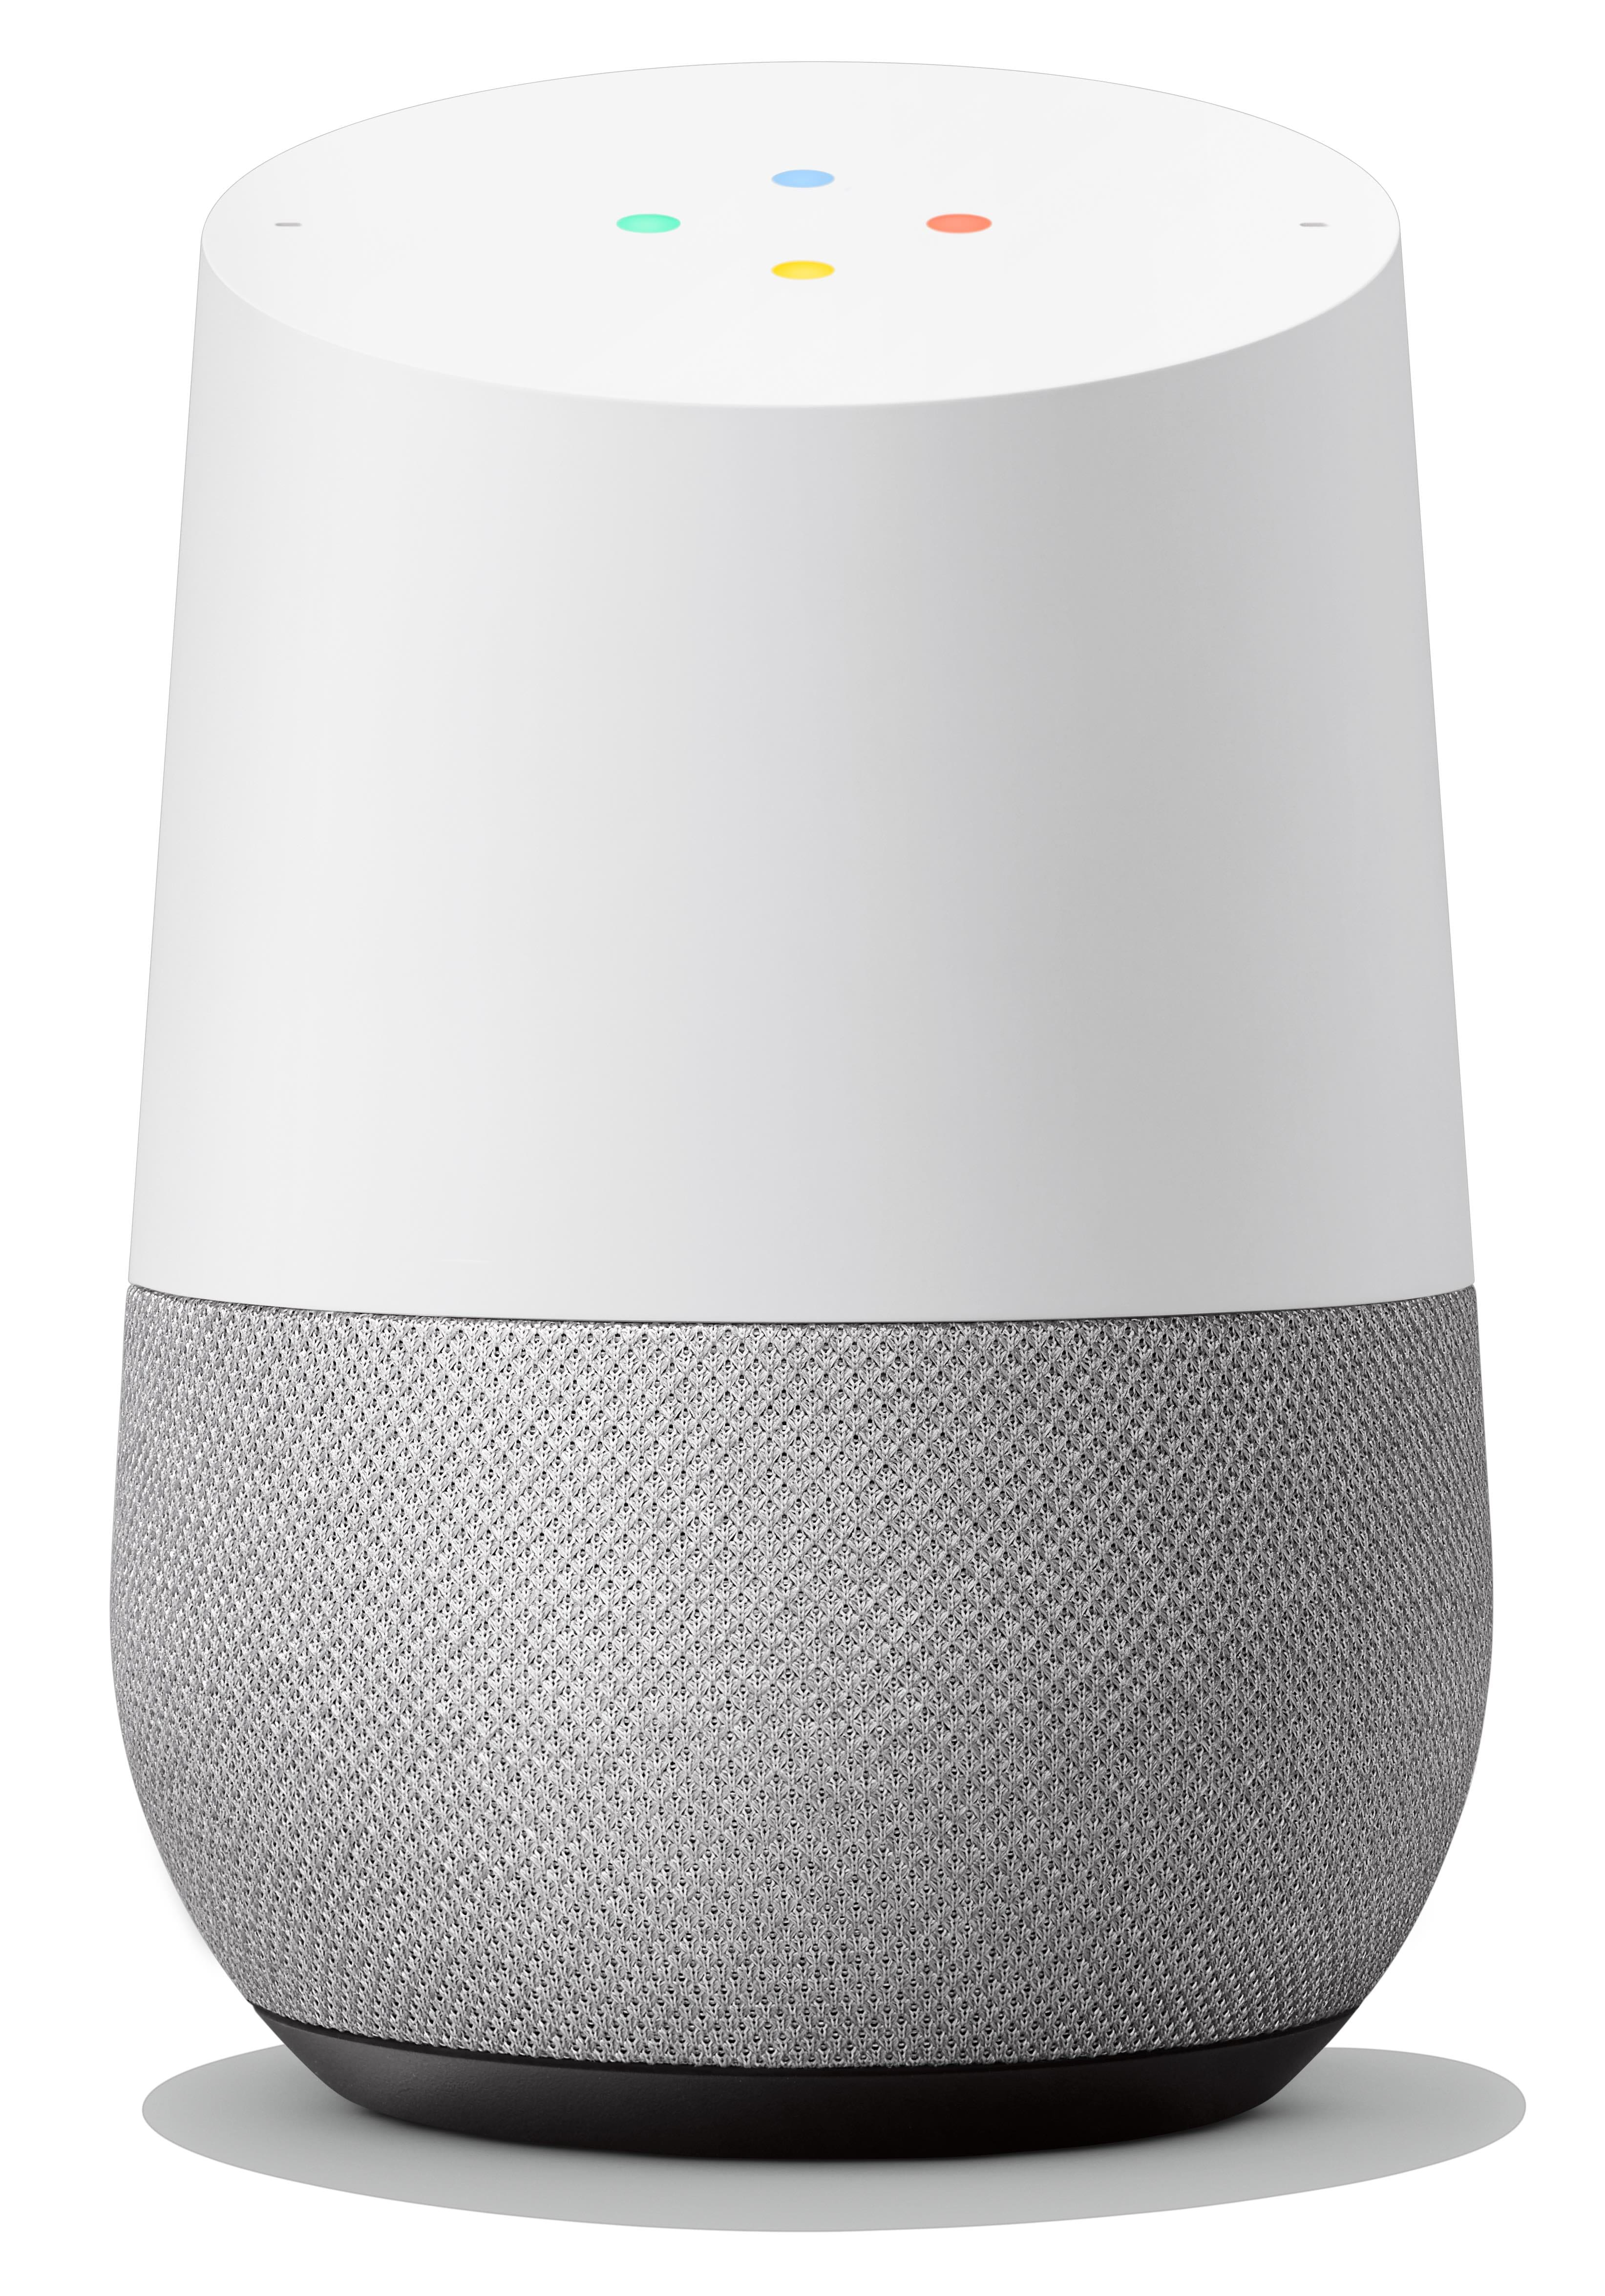 $33 - Google Home - Smart Speaker w/Google Assistant - YMMV